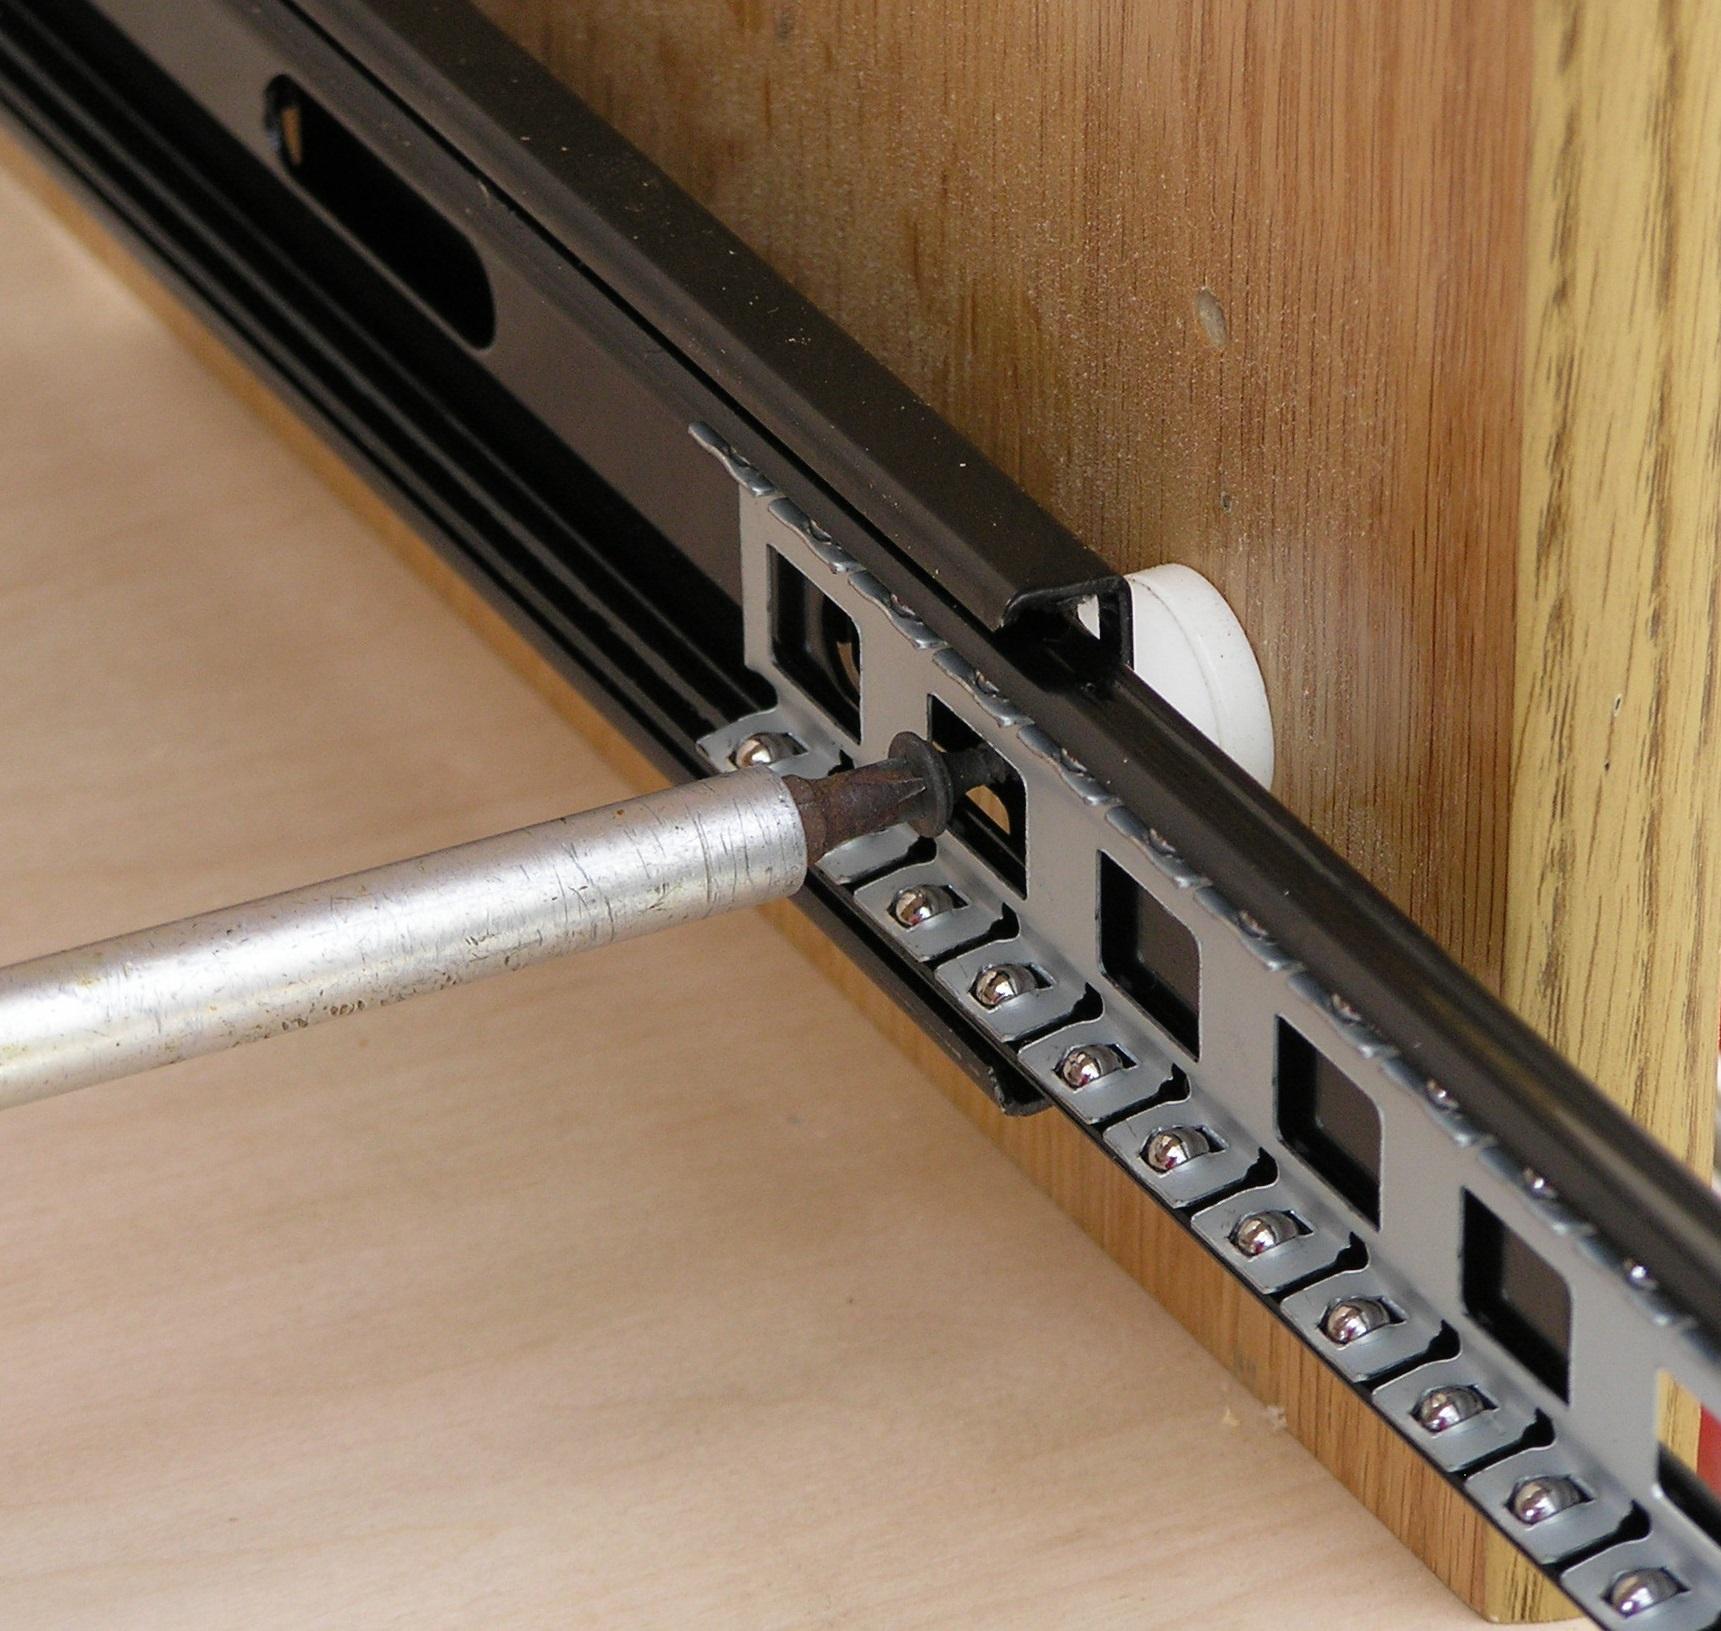 stand-off-slide-shelf-001.jpg